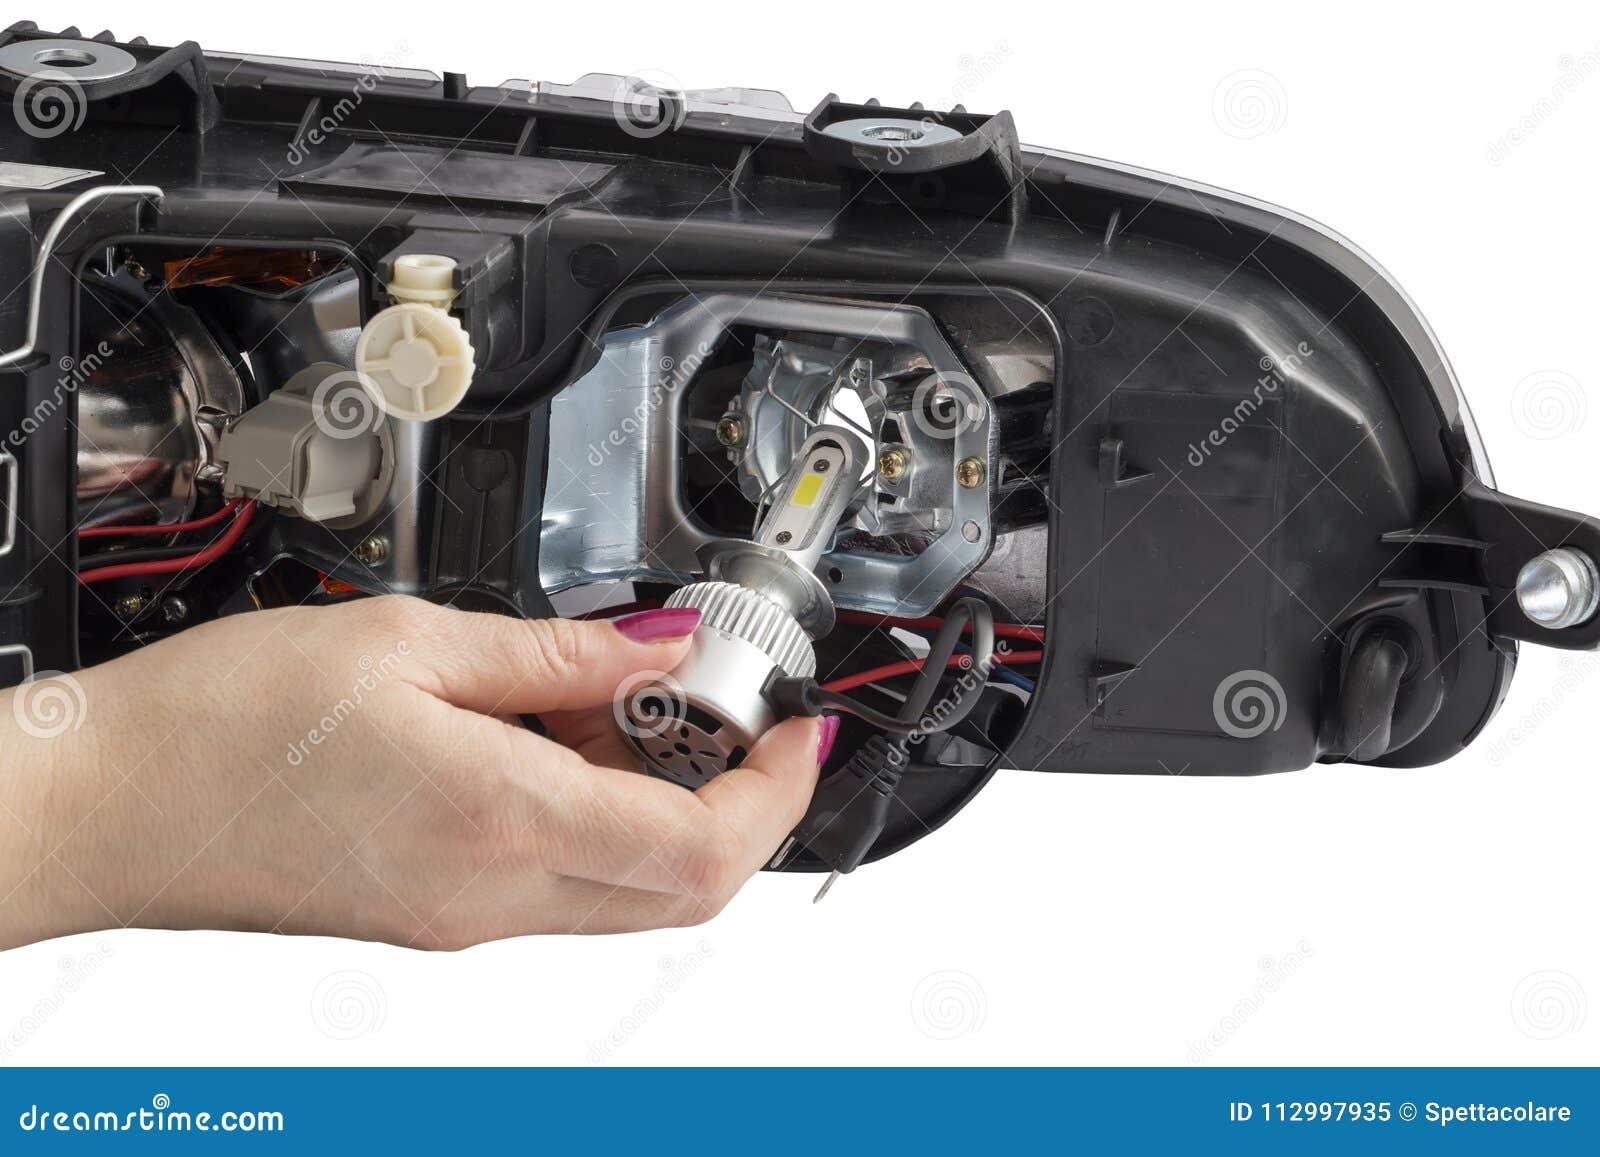 Car Headlight Bulb Wiring - Data Diagram Schematic on h1 bulb diagram, h10 bulb diagram, dual filament bulb diagram, h3 bulb diagram,